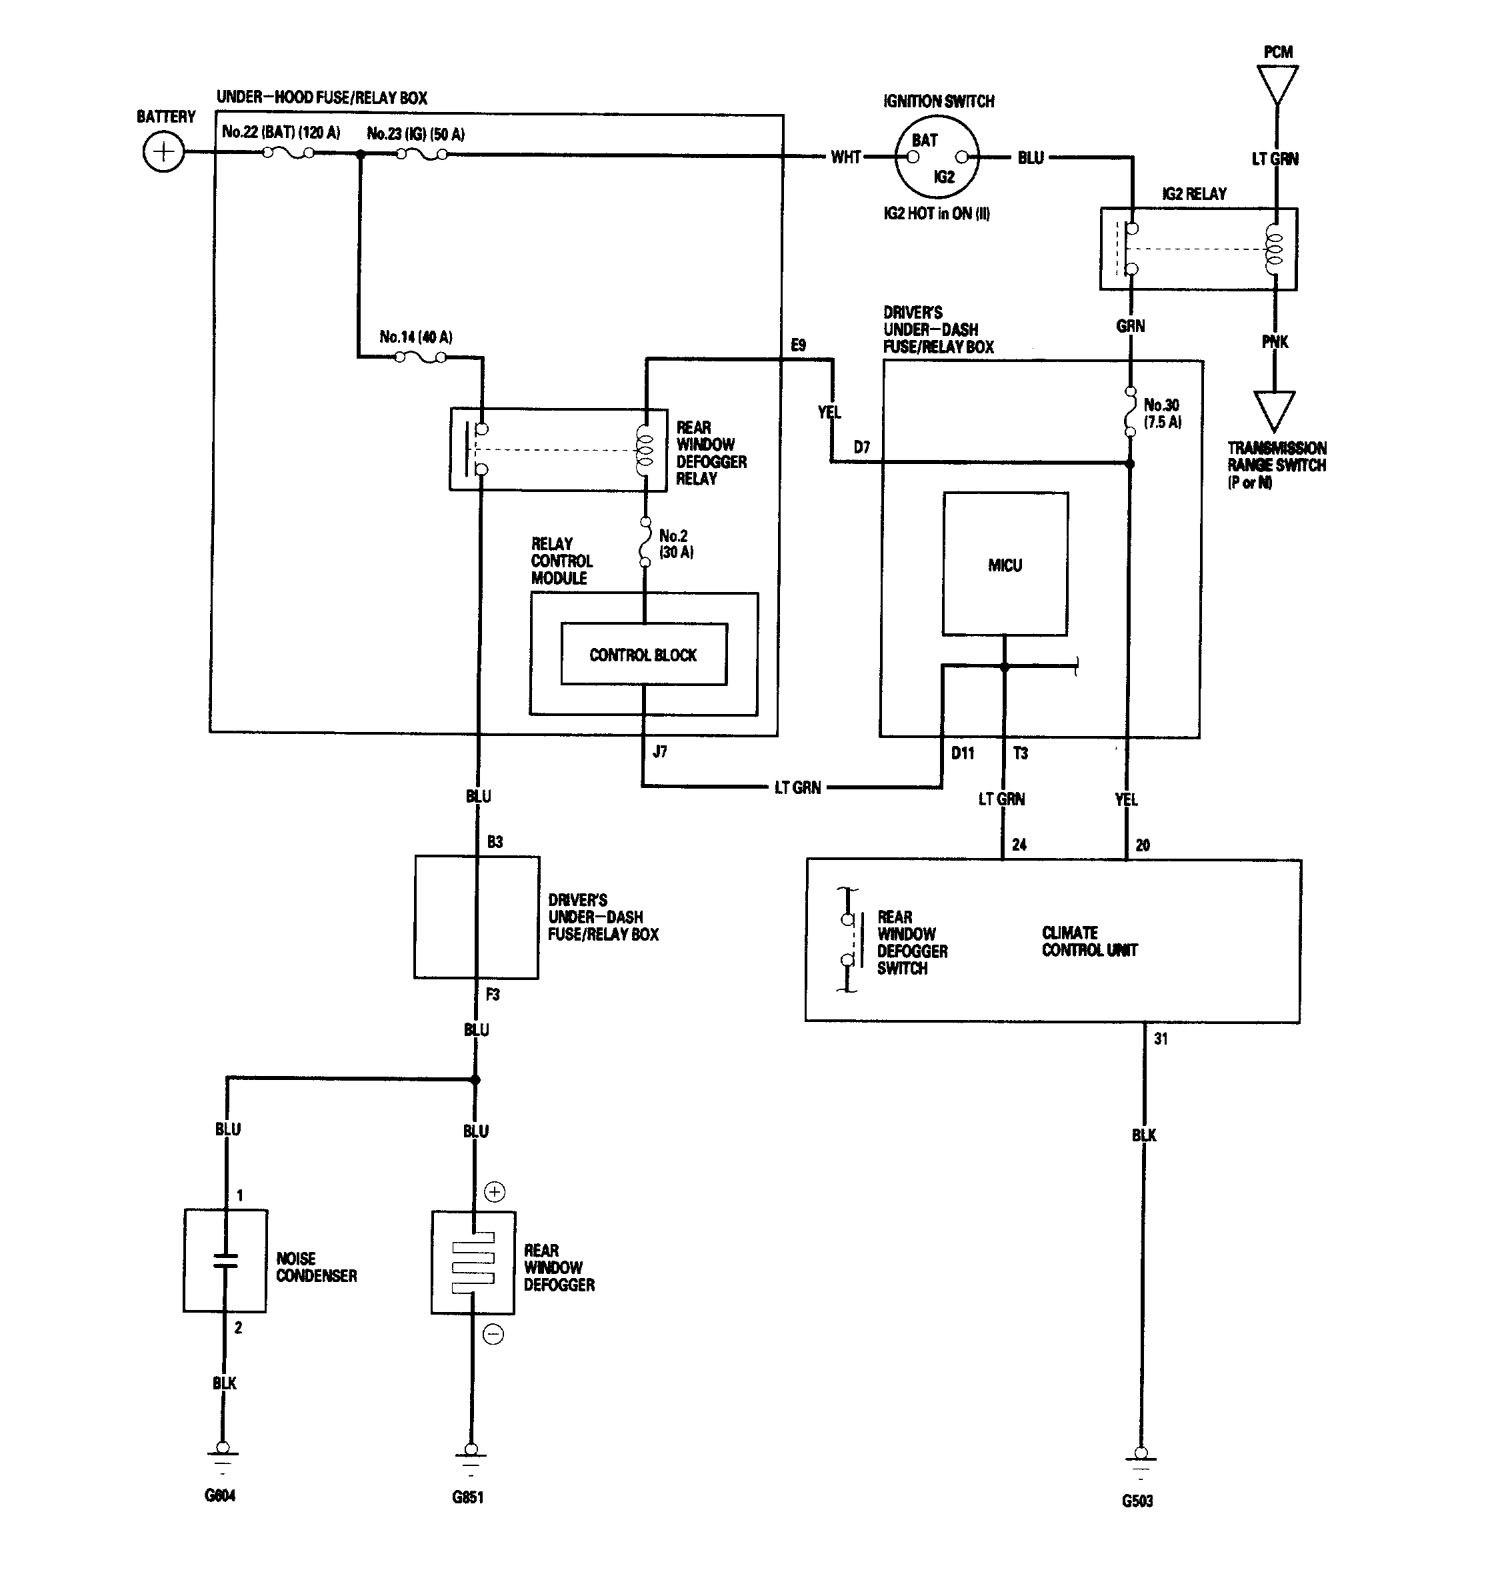 2002 Acura Rsx Headlight Wiring Diagram Lexus IS250